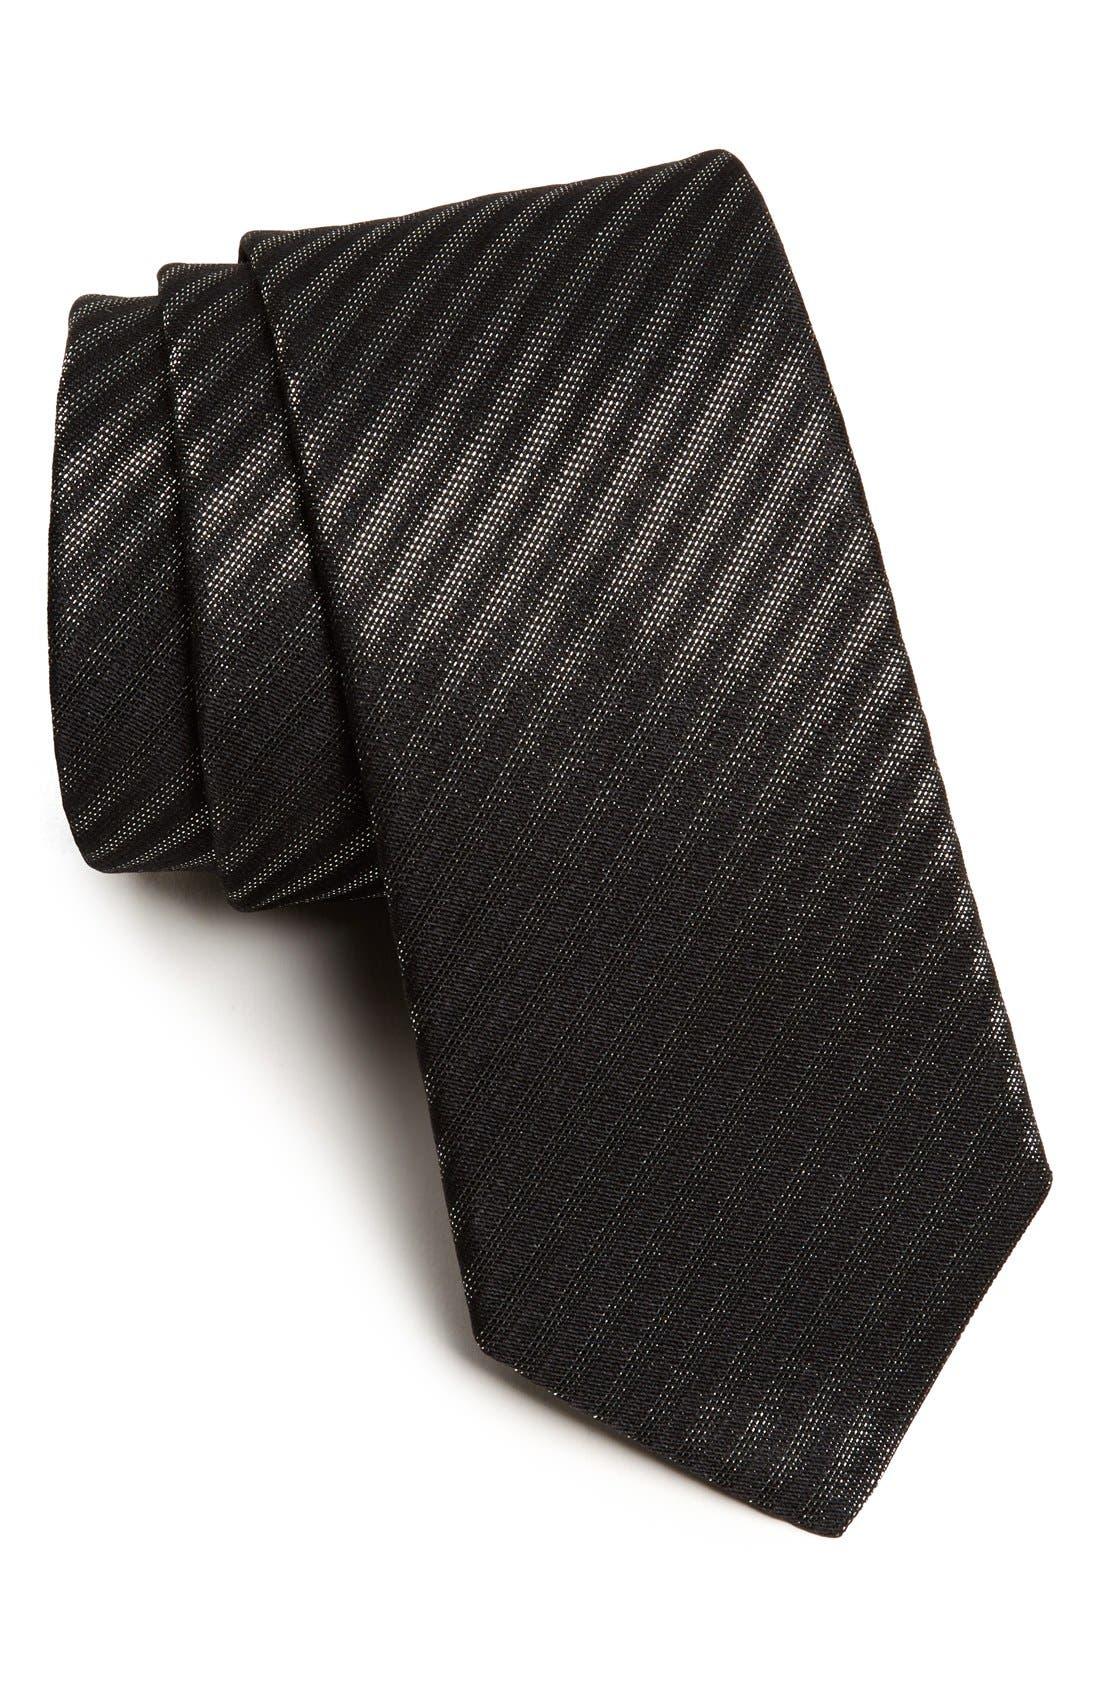 Alternate Image 1 Selected - Yves Saint Laurent Woven Silk Blend Tie